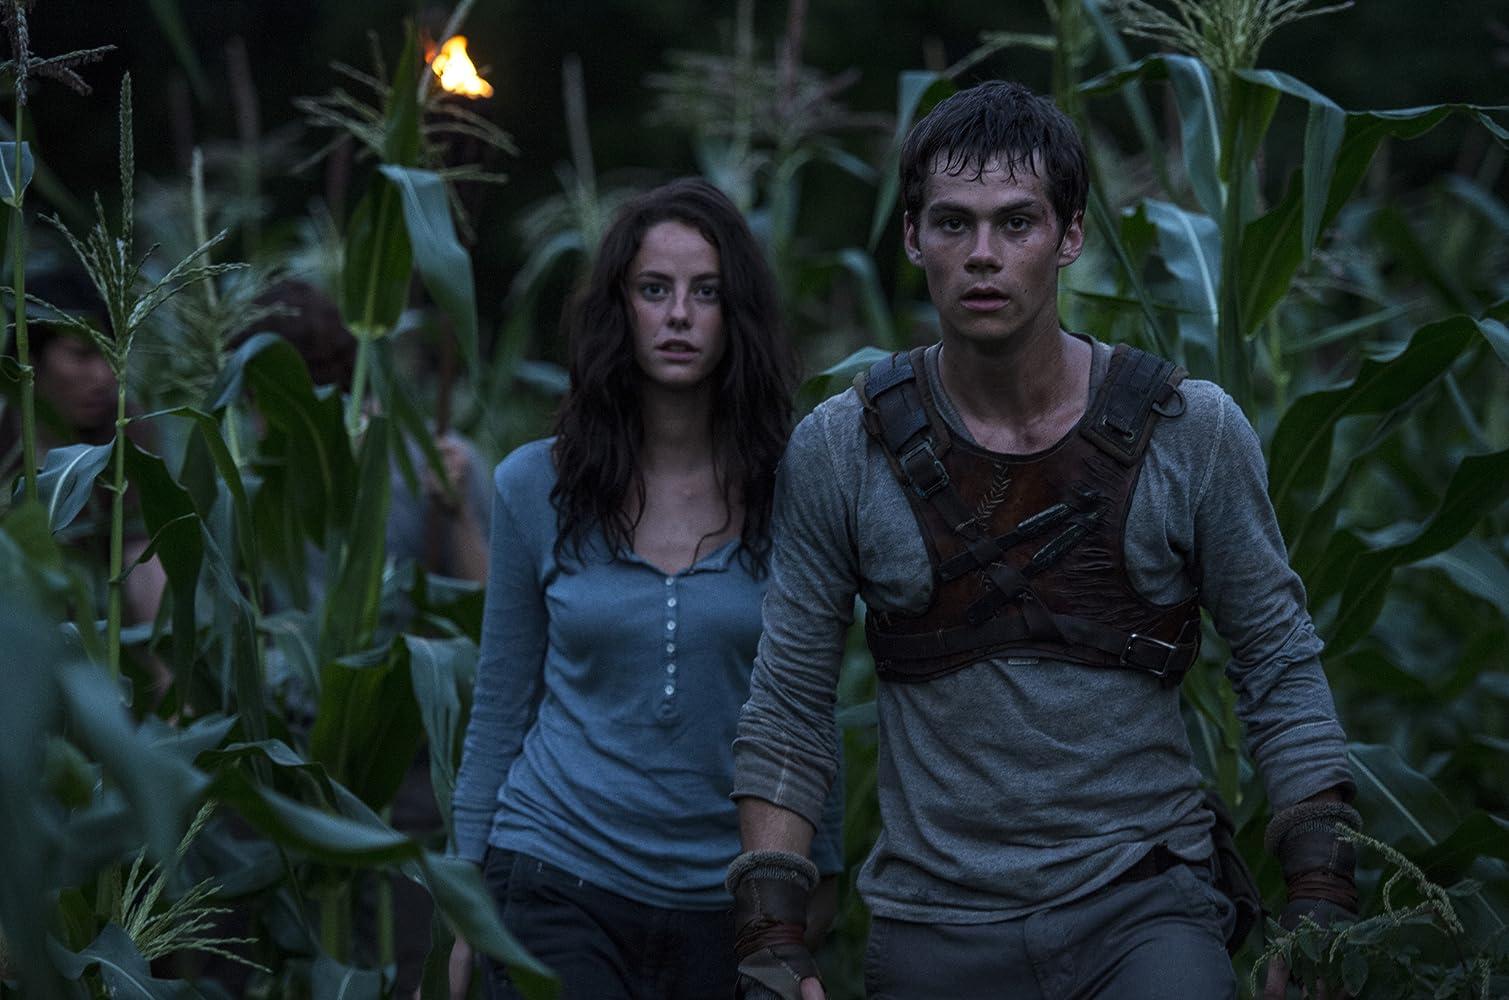 Kaya Scodelario and Dylan O'Brien in The Maze Runner (2014)